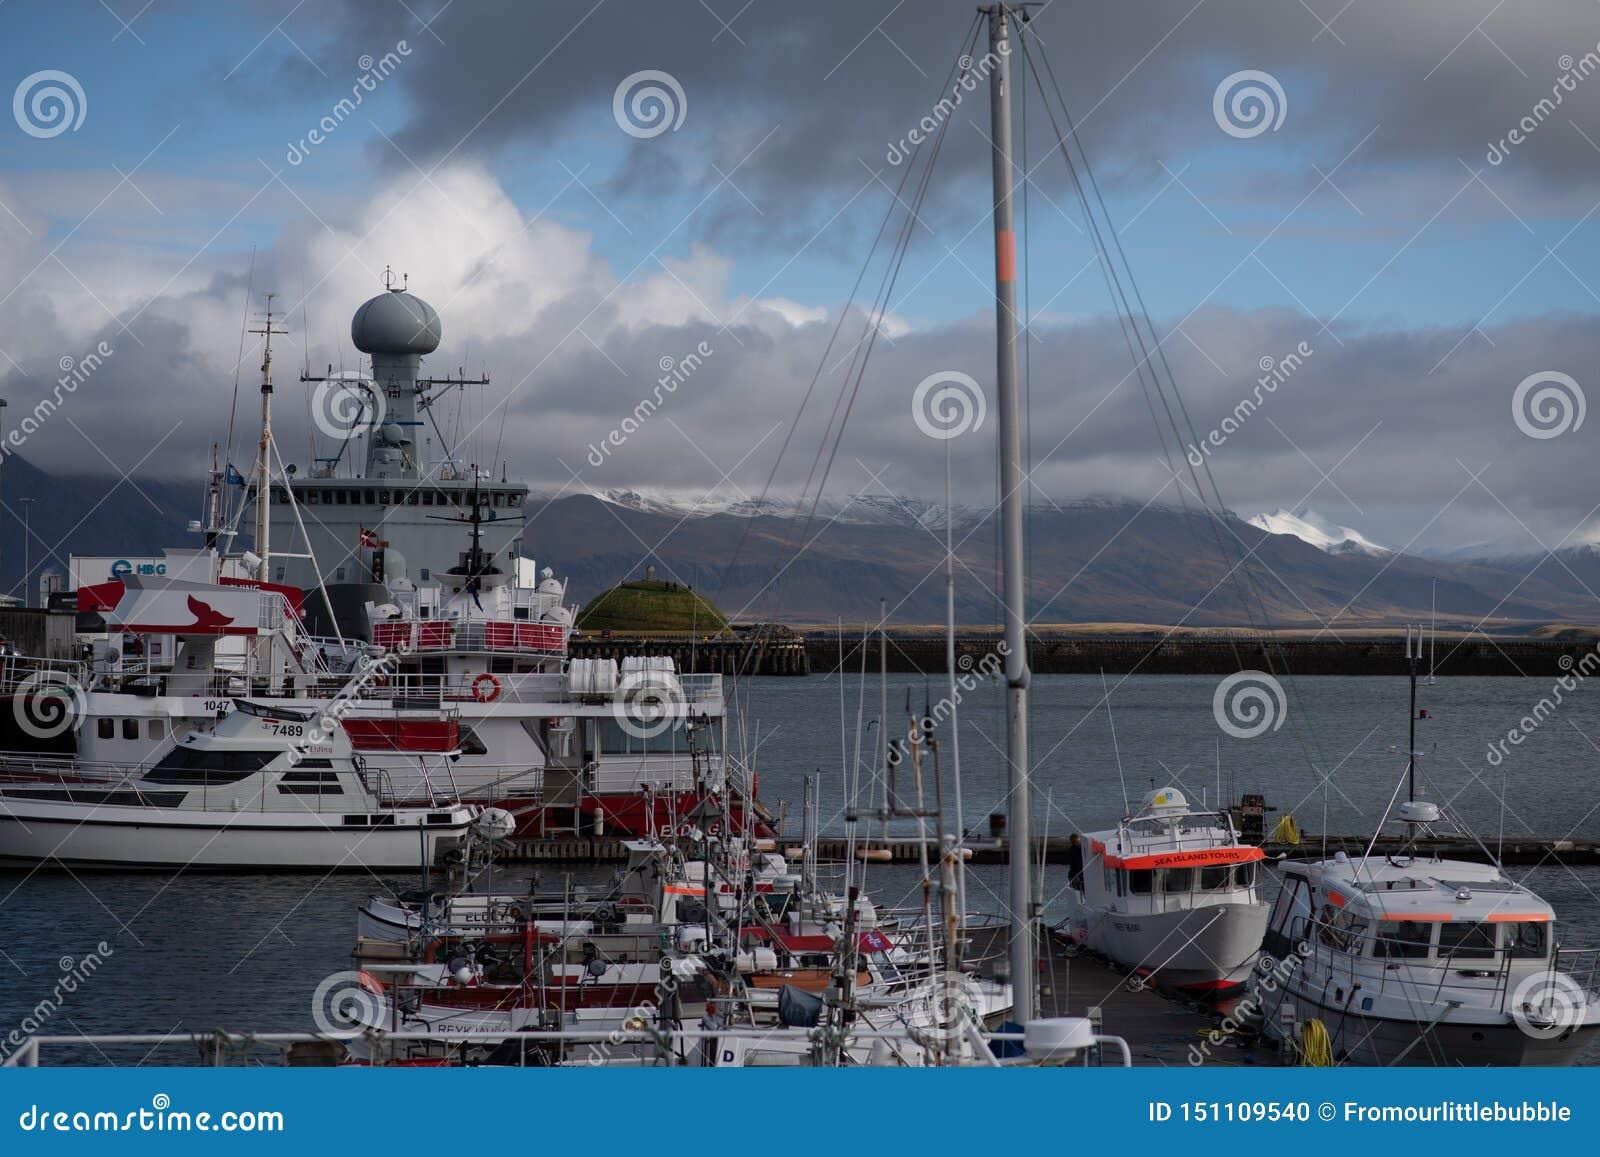 Ship housing a weather station in Reykjavik